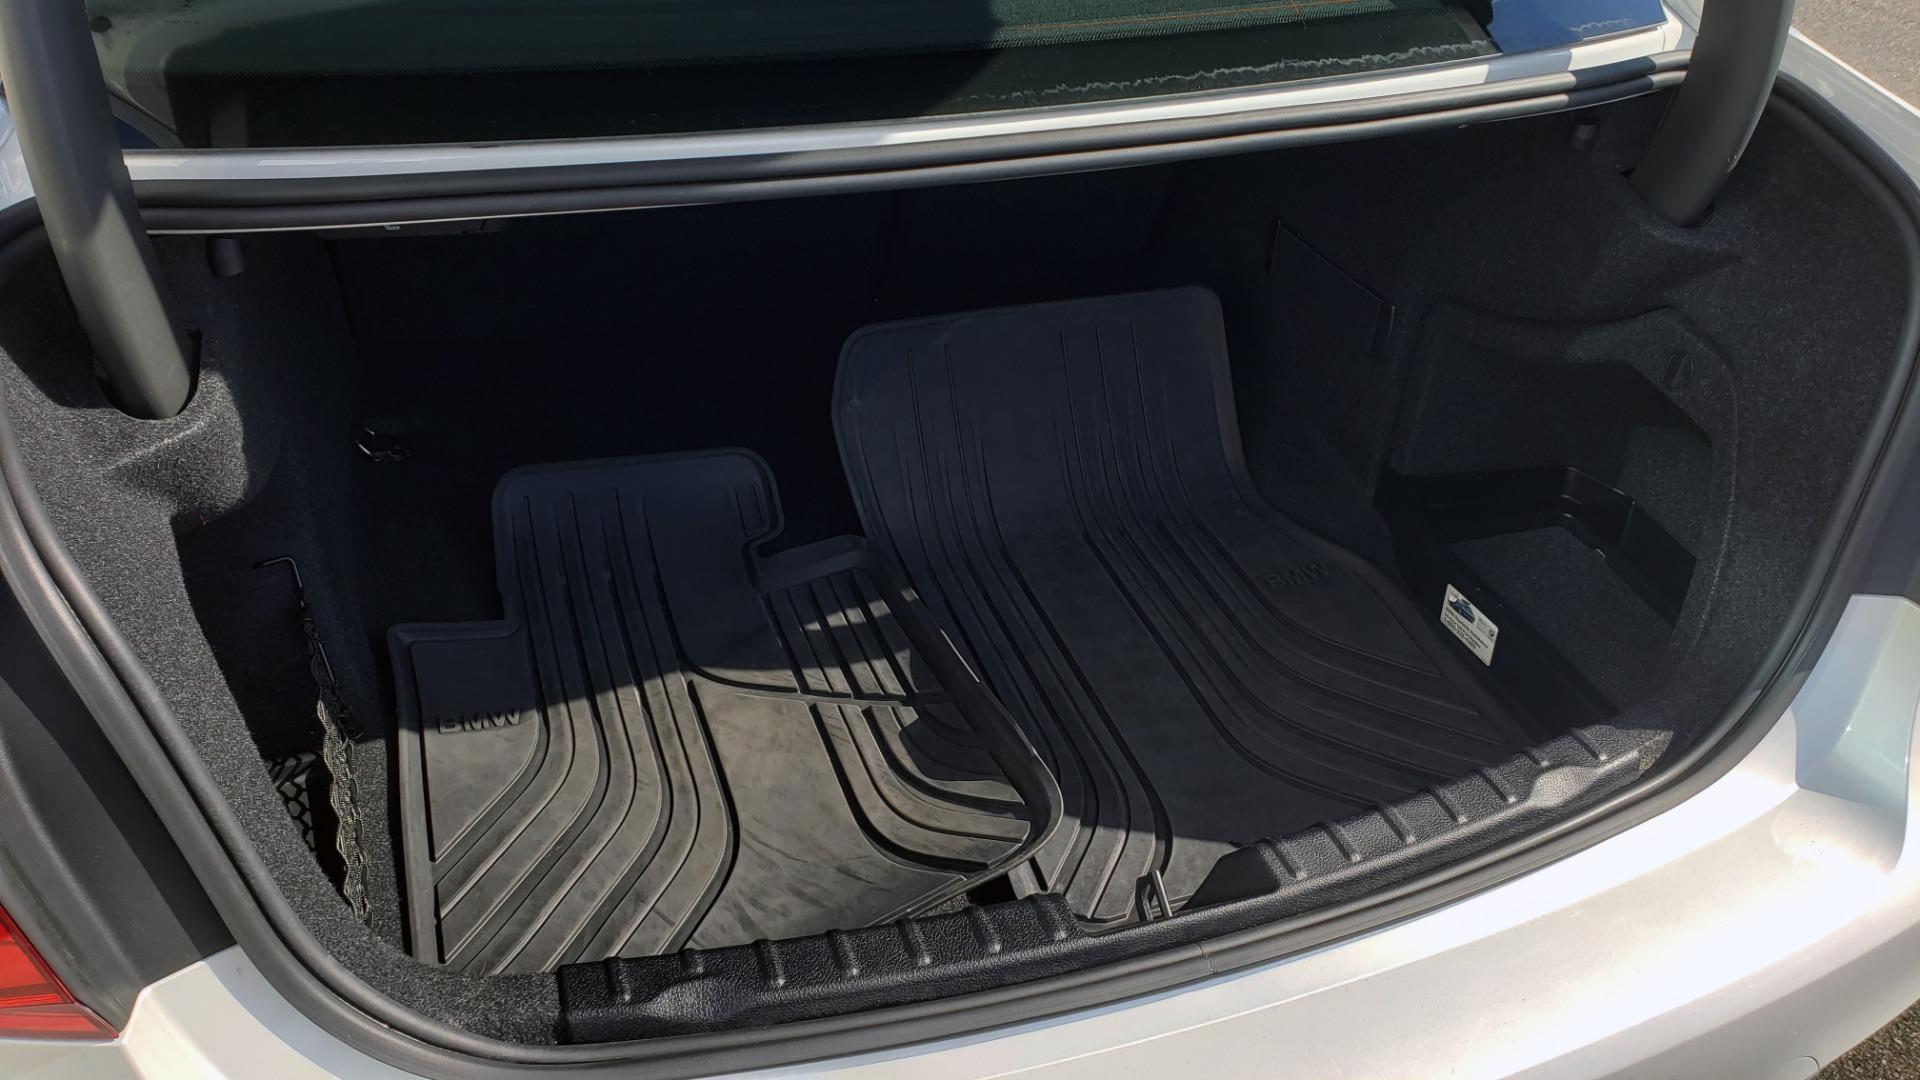 Used 2016 BMW M3 SEDAN / EXECUTIVE PKG / M-SUSPENSION / HARMAN/KARDON SOUND for sale Sold at Formula Imports in Charlotte NC 28227 27